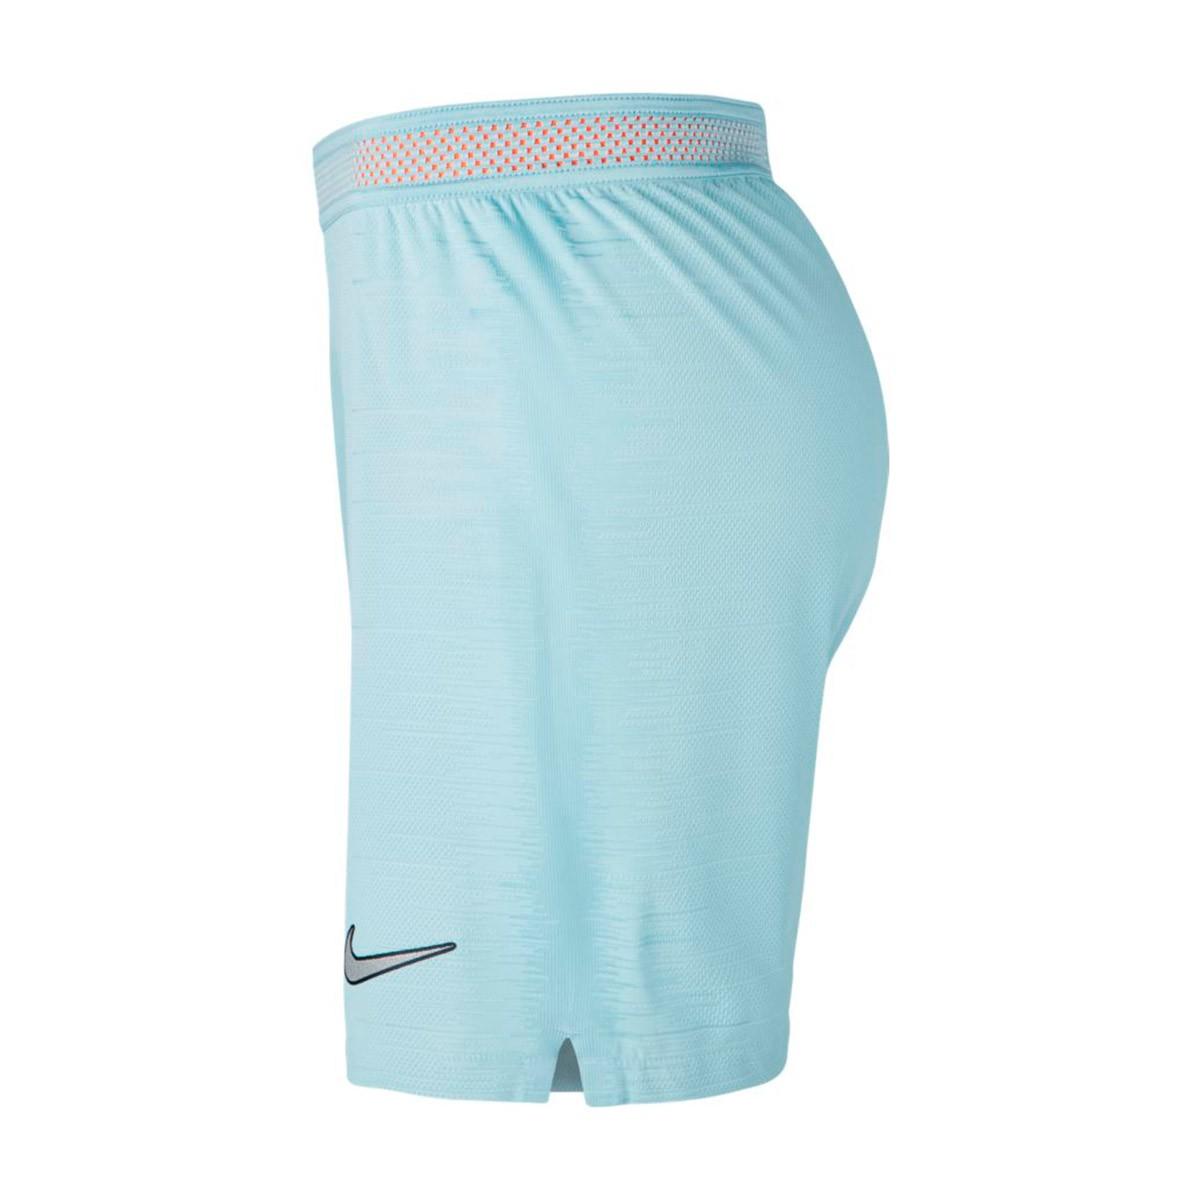 f57c10e9f60 Shorts Nike Vapor Chelsea FC Match 2018-2019 Third Ocean bliss-Metallic  silver - Football store Fútbol Emotion